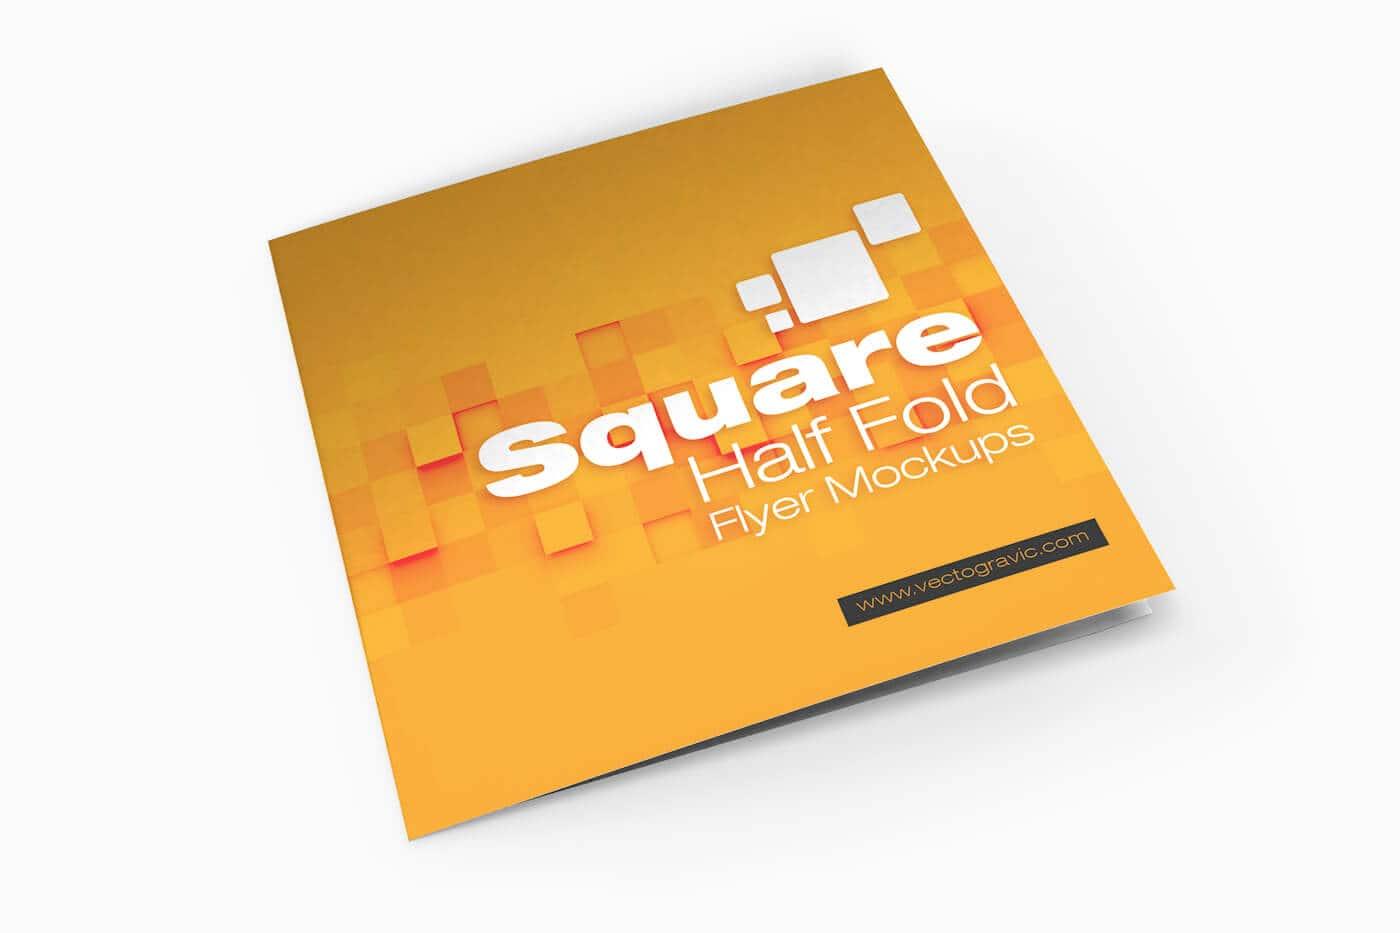 Square Half Fold Brochure Mockups 01 1